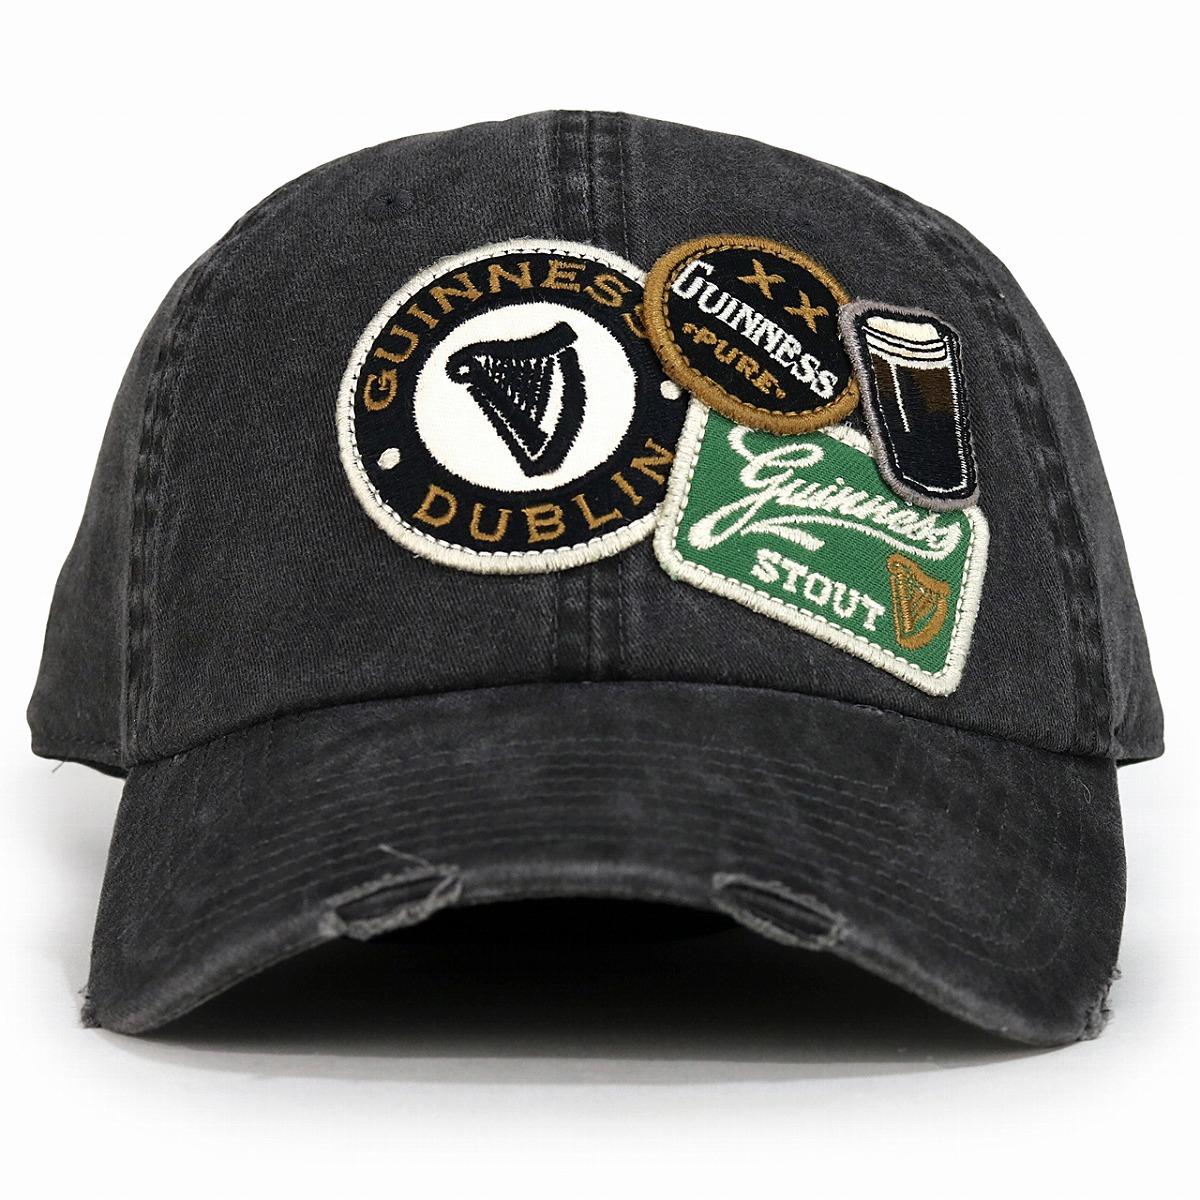 fffdb18c4 Cap Guinness emblem American needle GUINNESS baseball cap men AMERICAN  NEEDLE four season hat Lady's emblem Guinness cap black (Christmas gift  packing ...